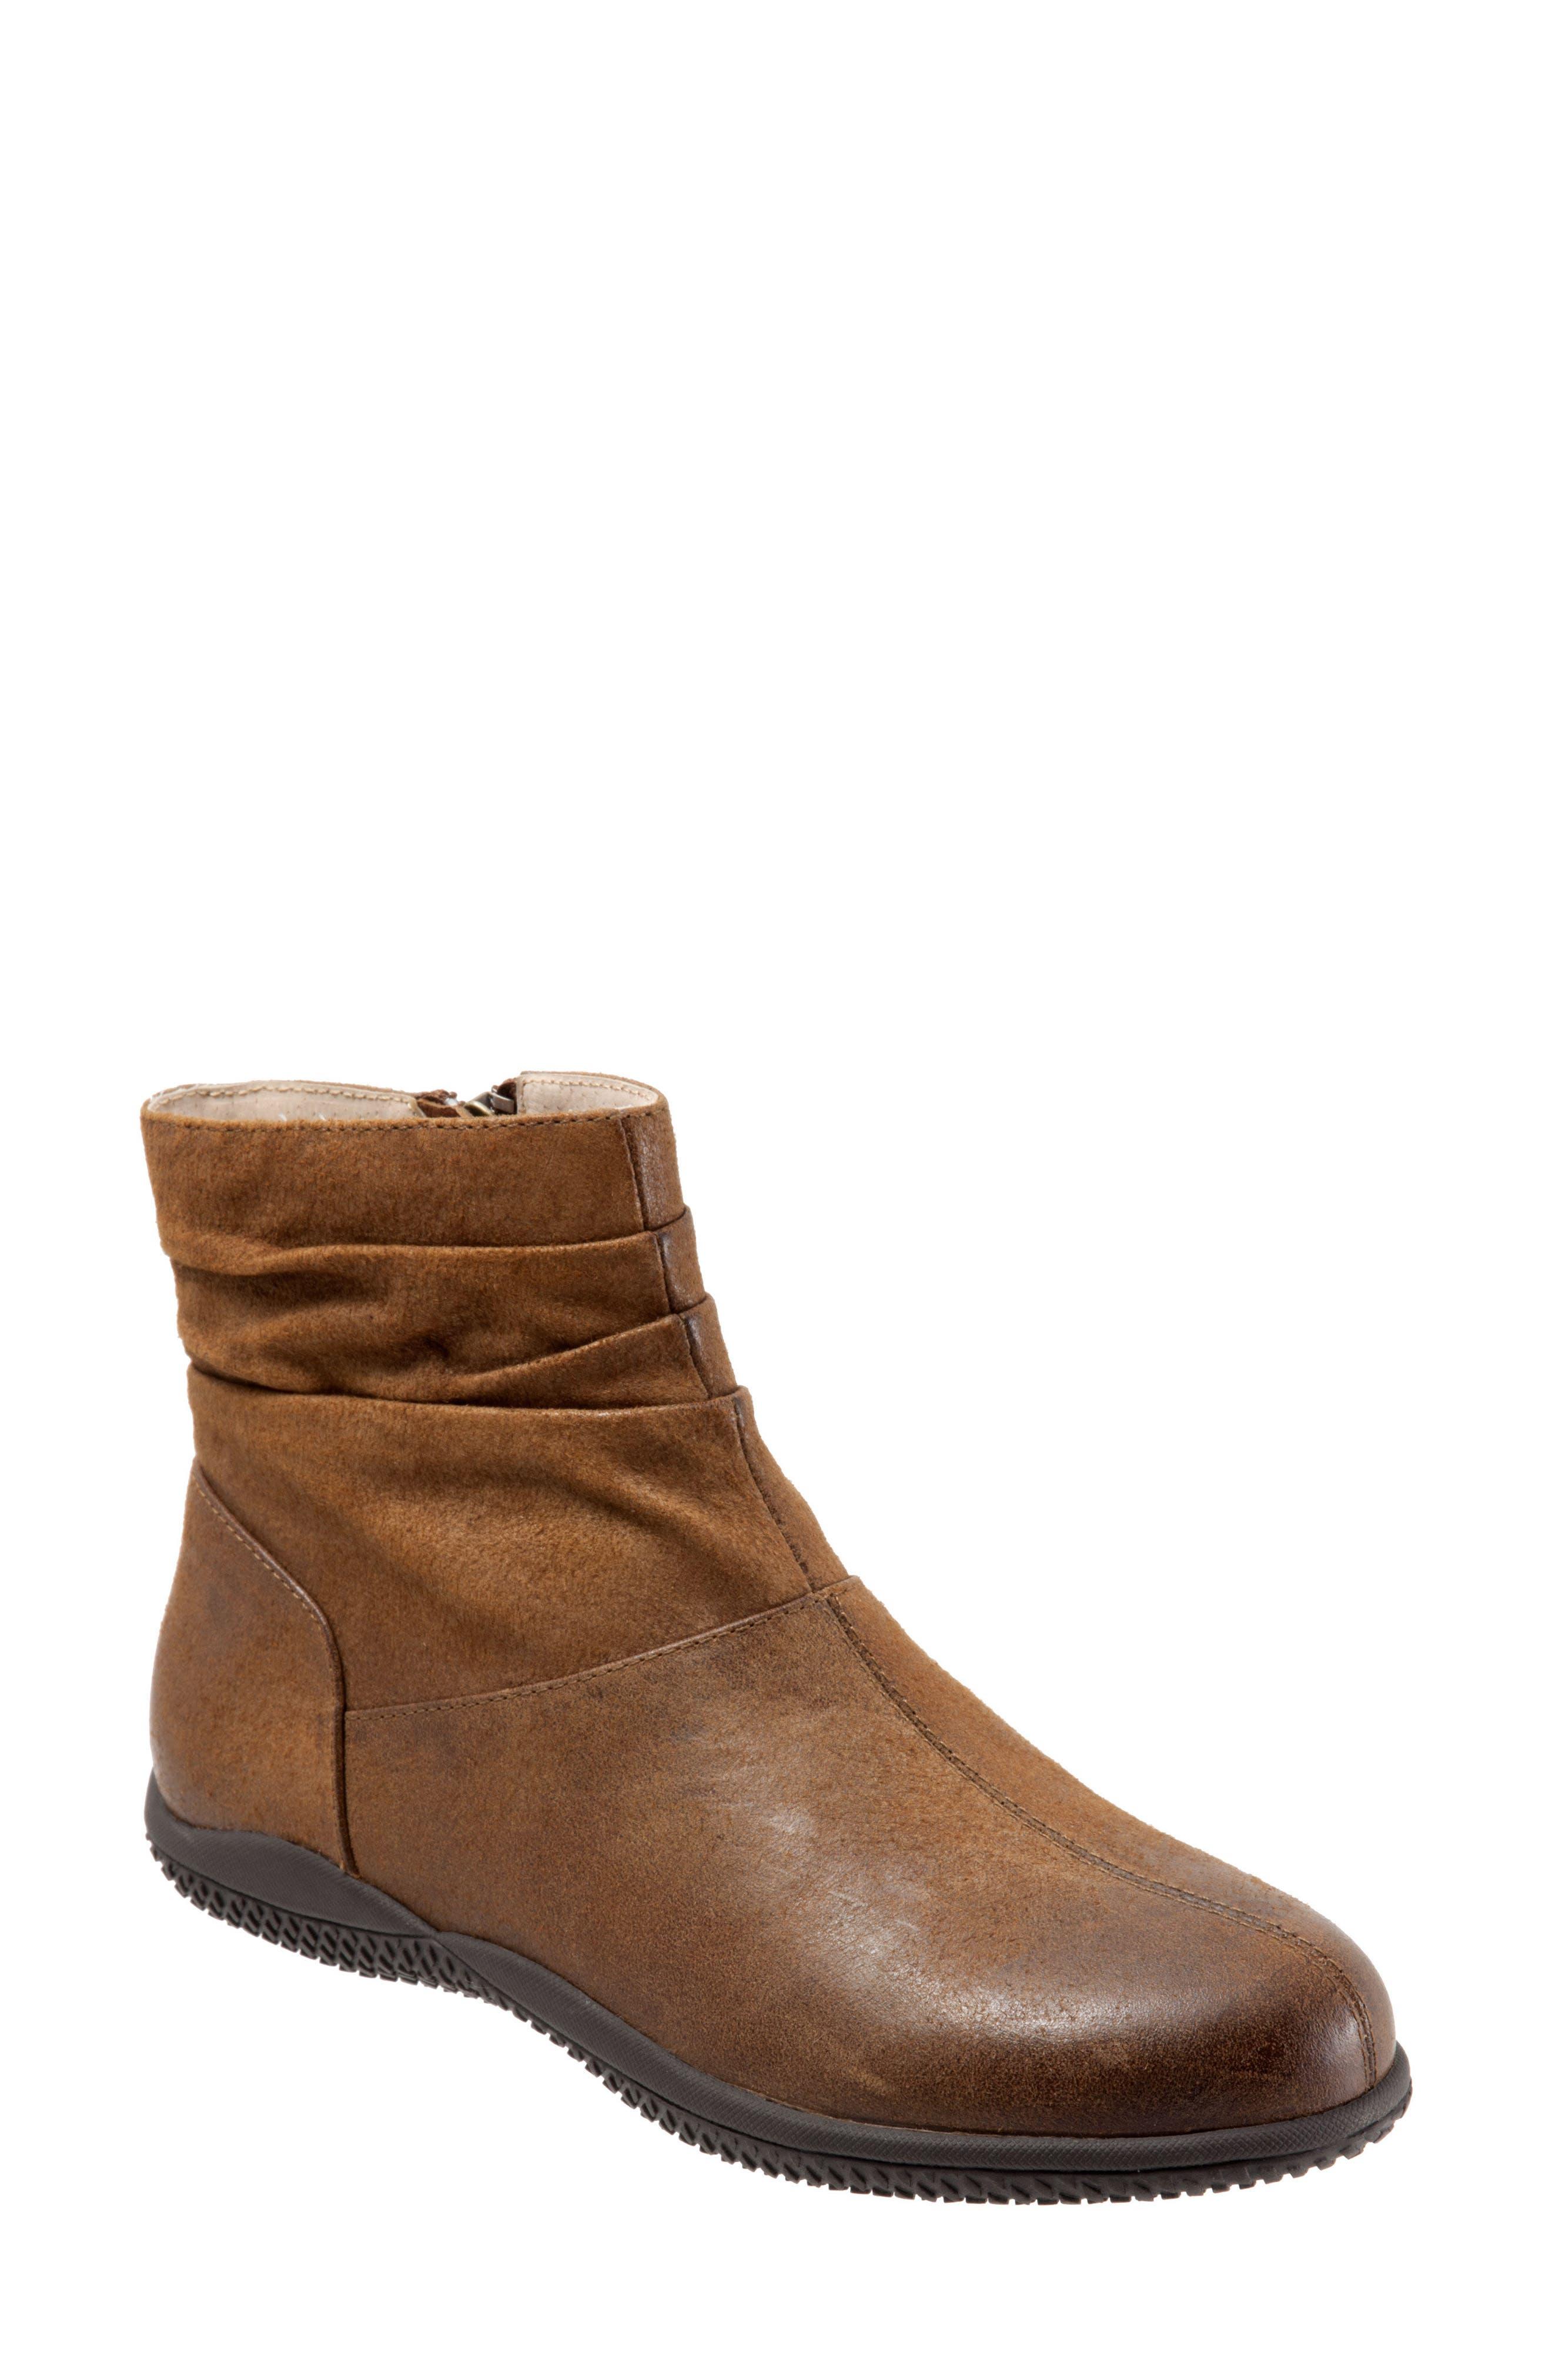 Alternate Image 1 Selected - SoftWalk® 'Hanover' Leather Boot (Women)